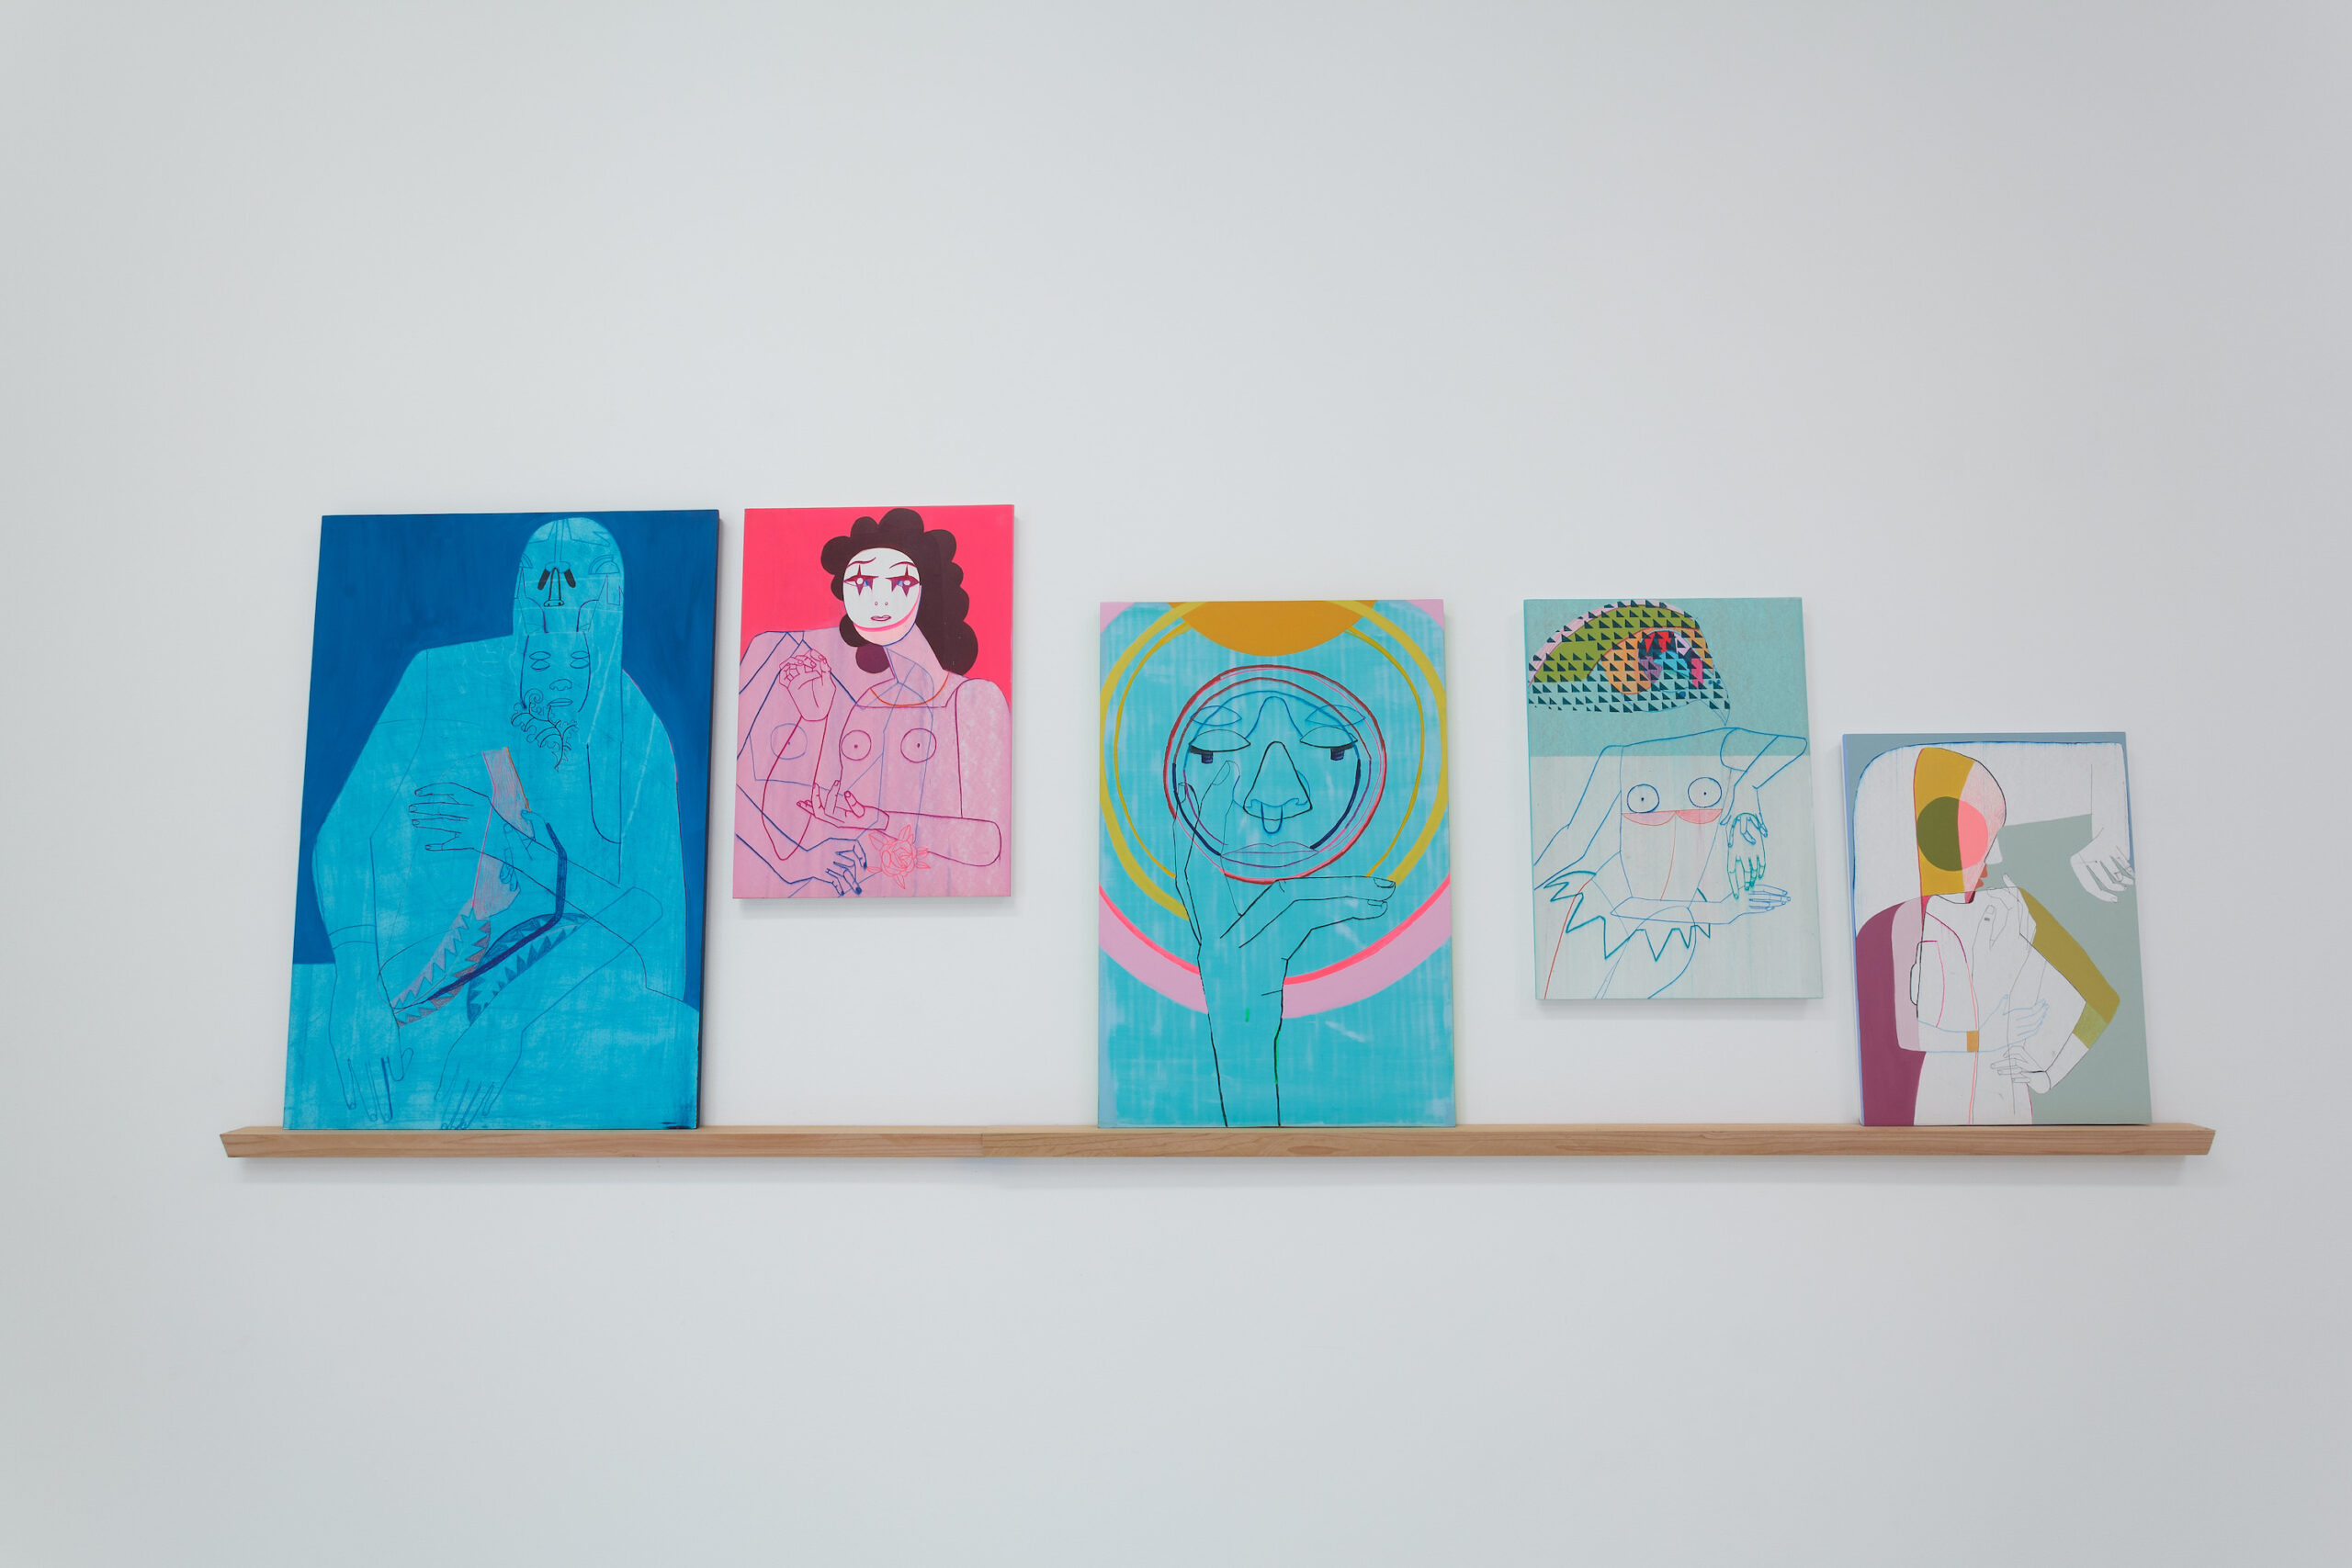 Kristen Schiele, 5 Works on a Cedar Shelf, 2021, Acrylic on panel on cedar shelf, Emerson Dorsch, Miami FL